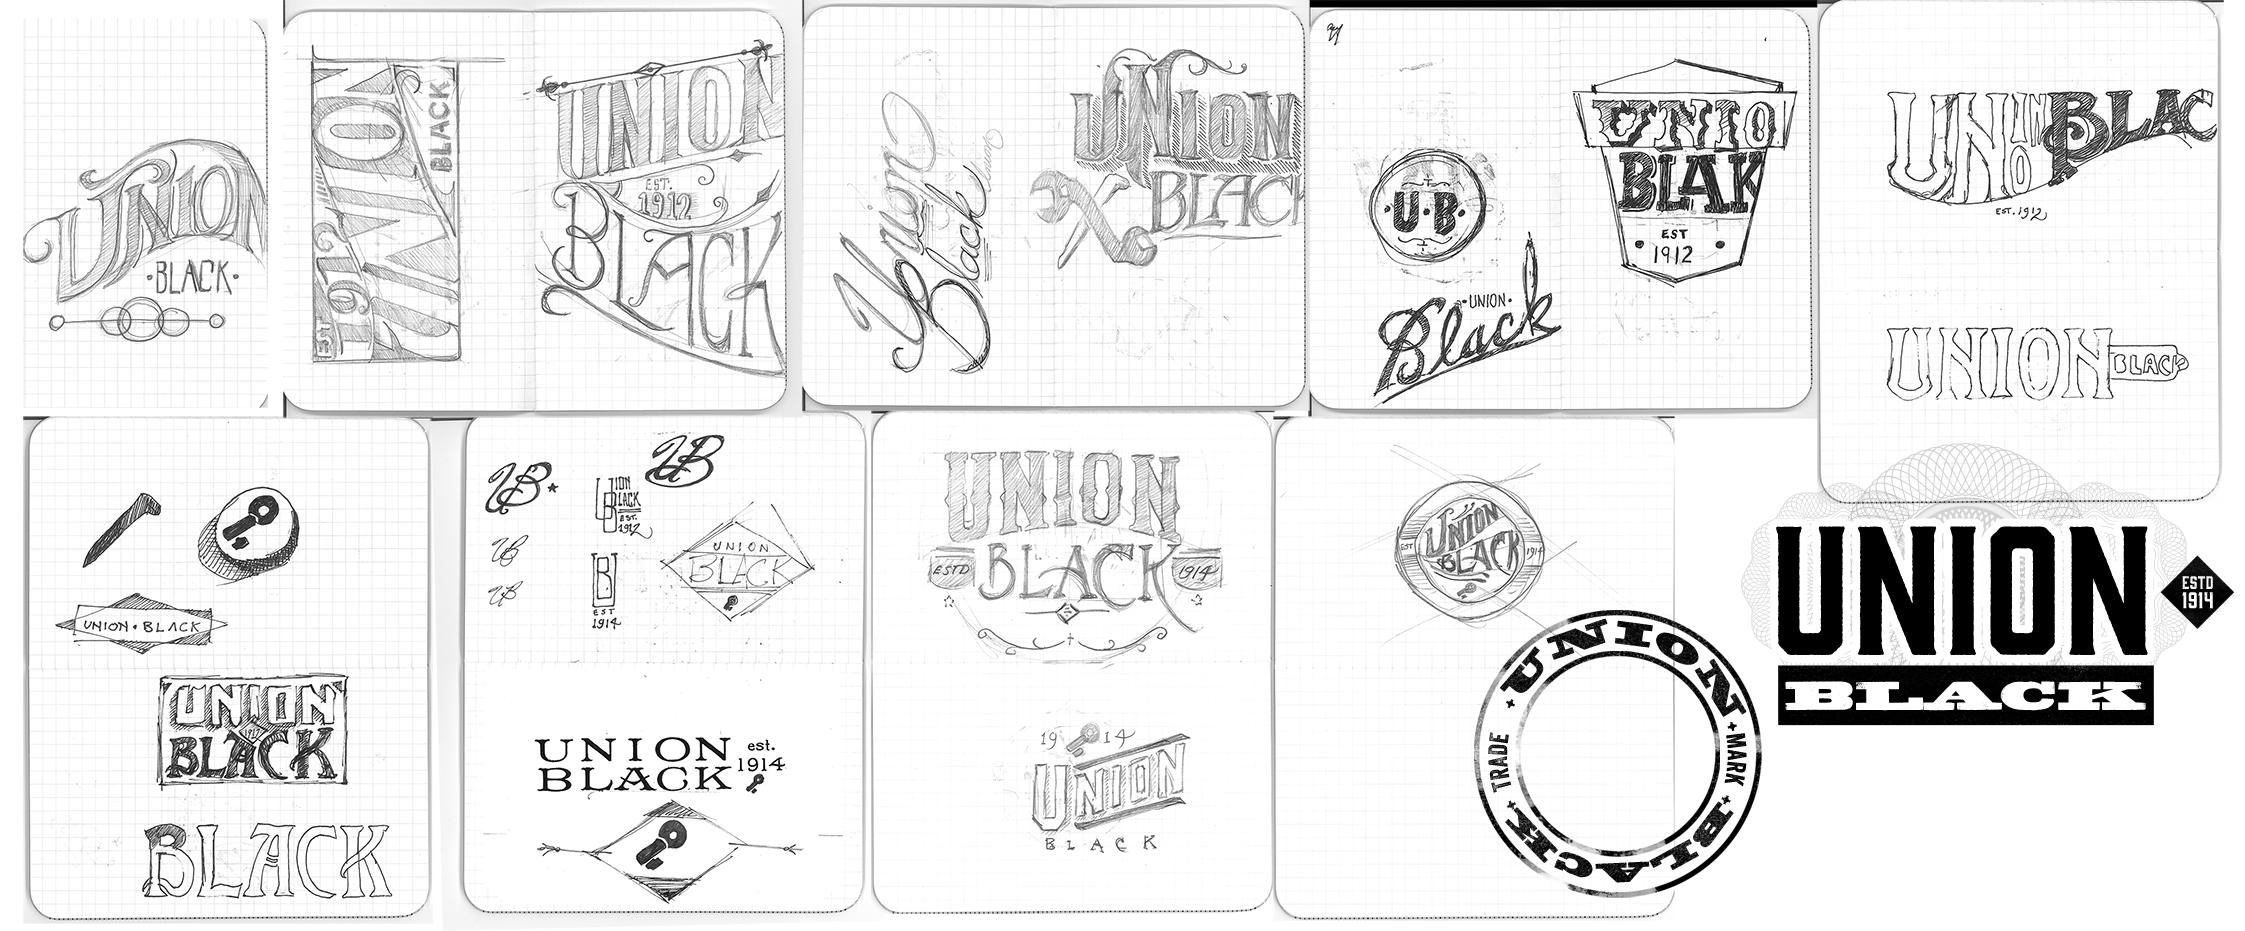 Union Black Work Wear - image 2 - student project